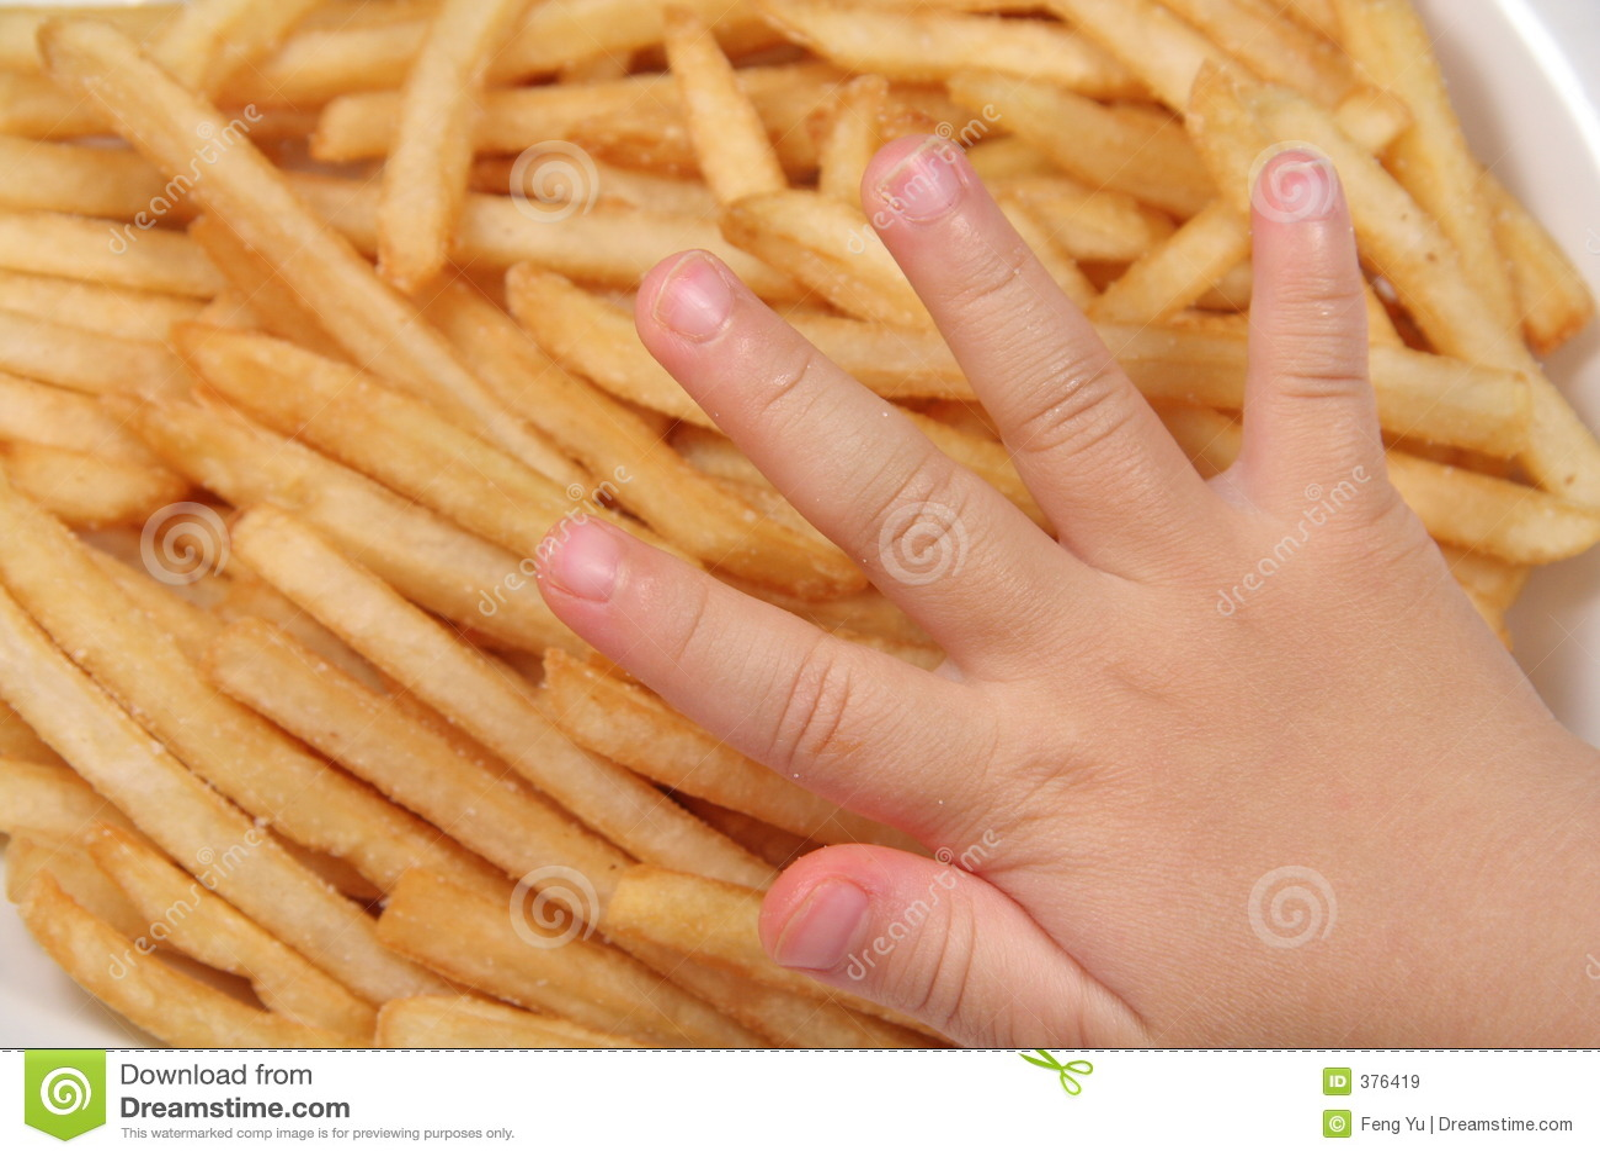 Pommes-Frites und Kindhand